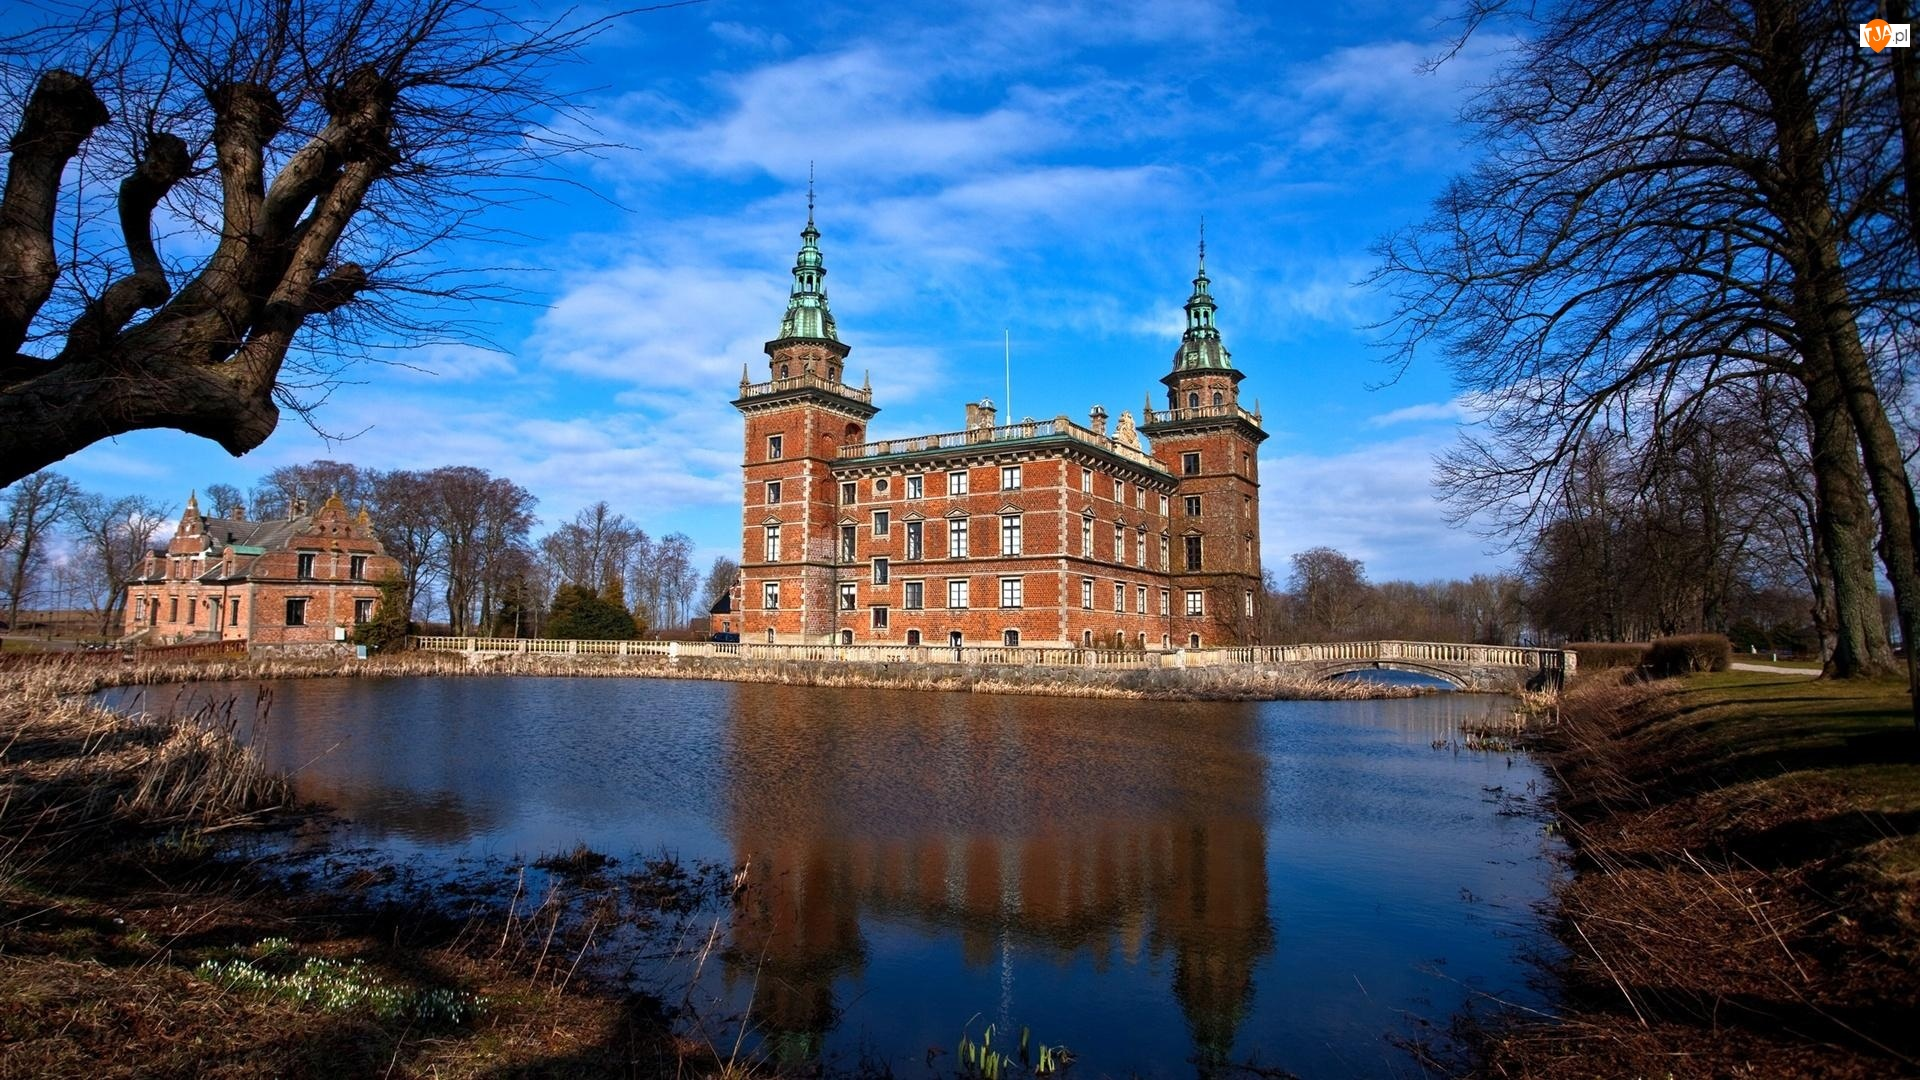 Szwecja, Most, Gmina Kristianstad, Zamek Trolle-Ljungby, Fosa